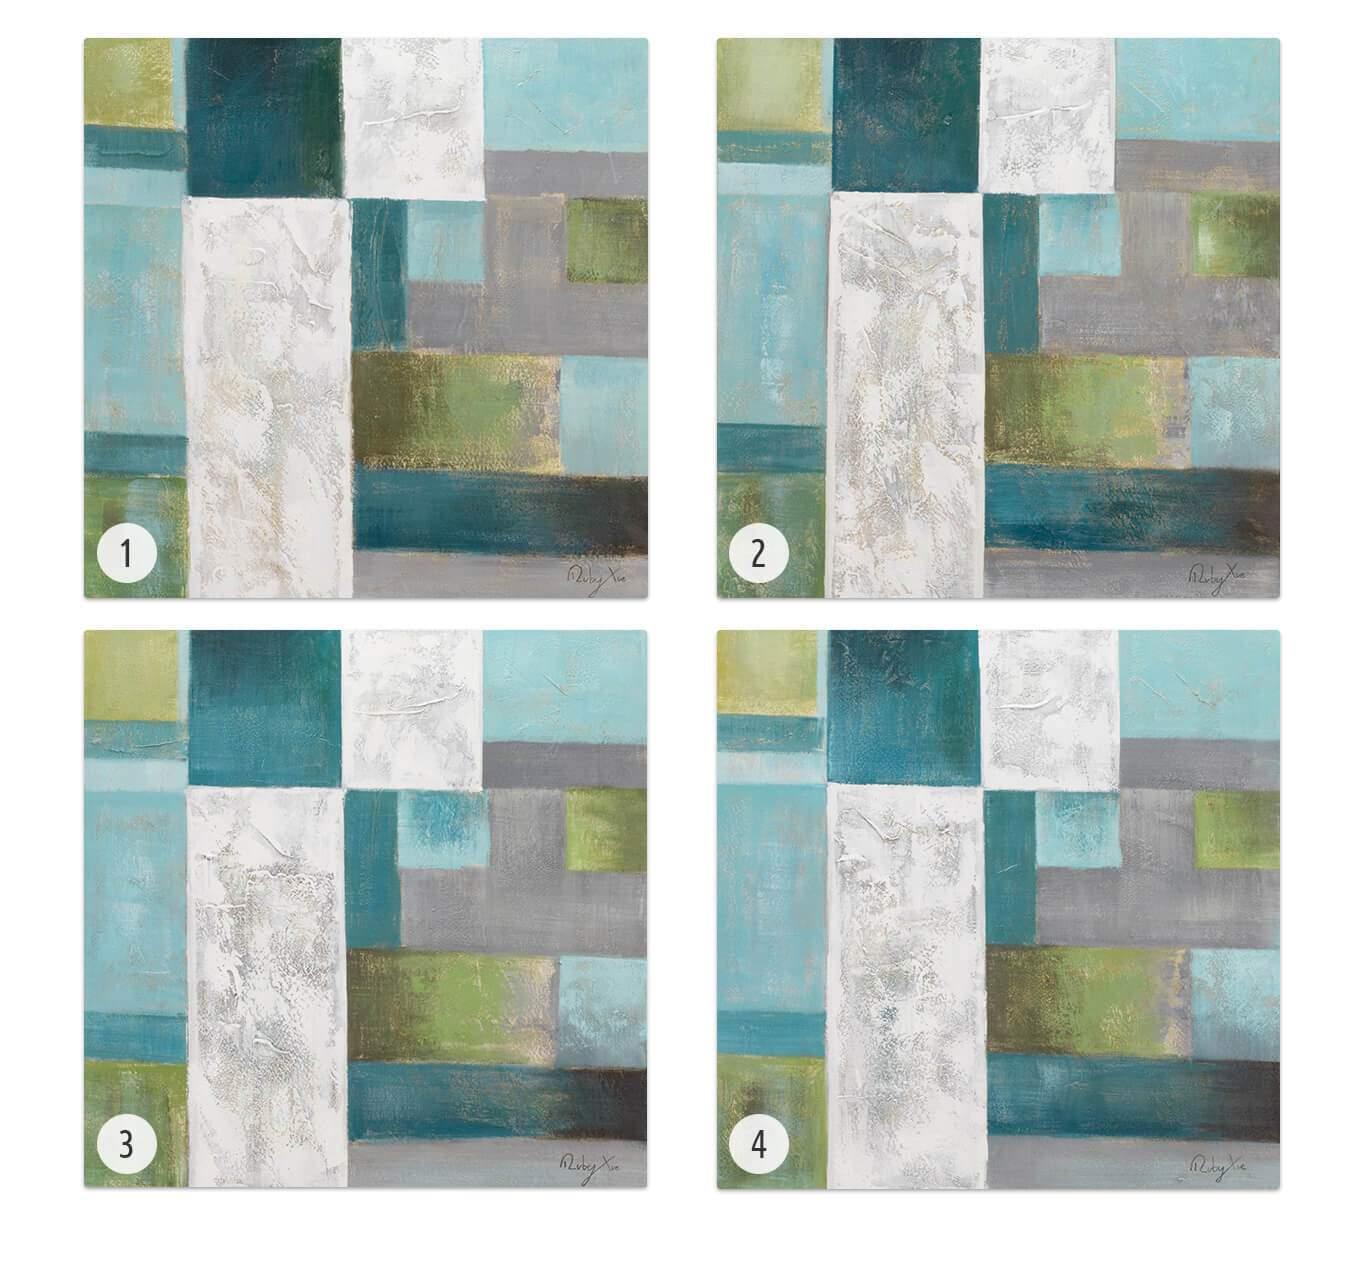 KL modern quadrate modern acryl gemaelde oel bild oelgemaelde 08